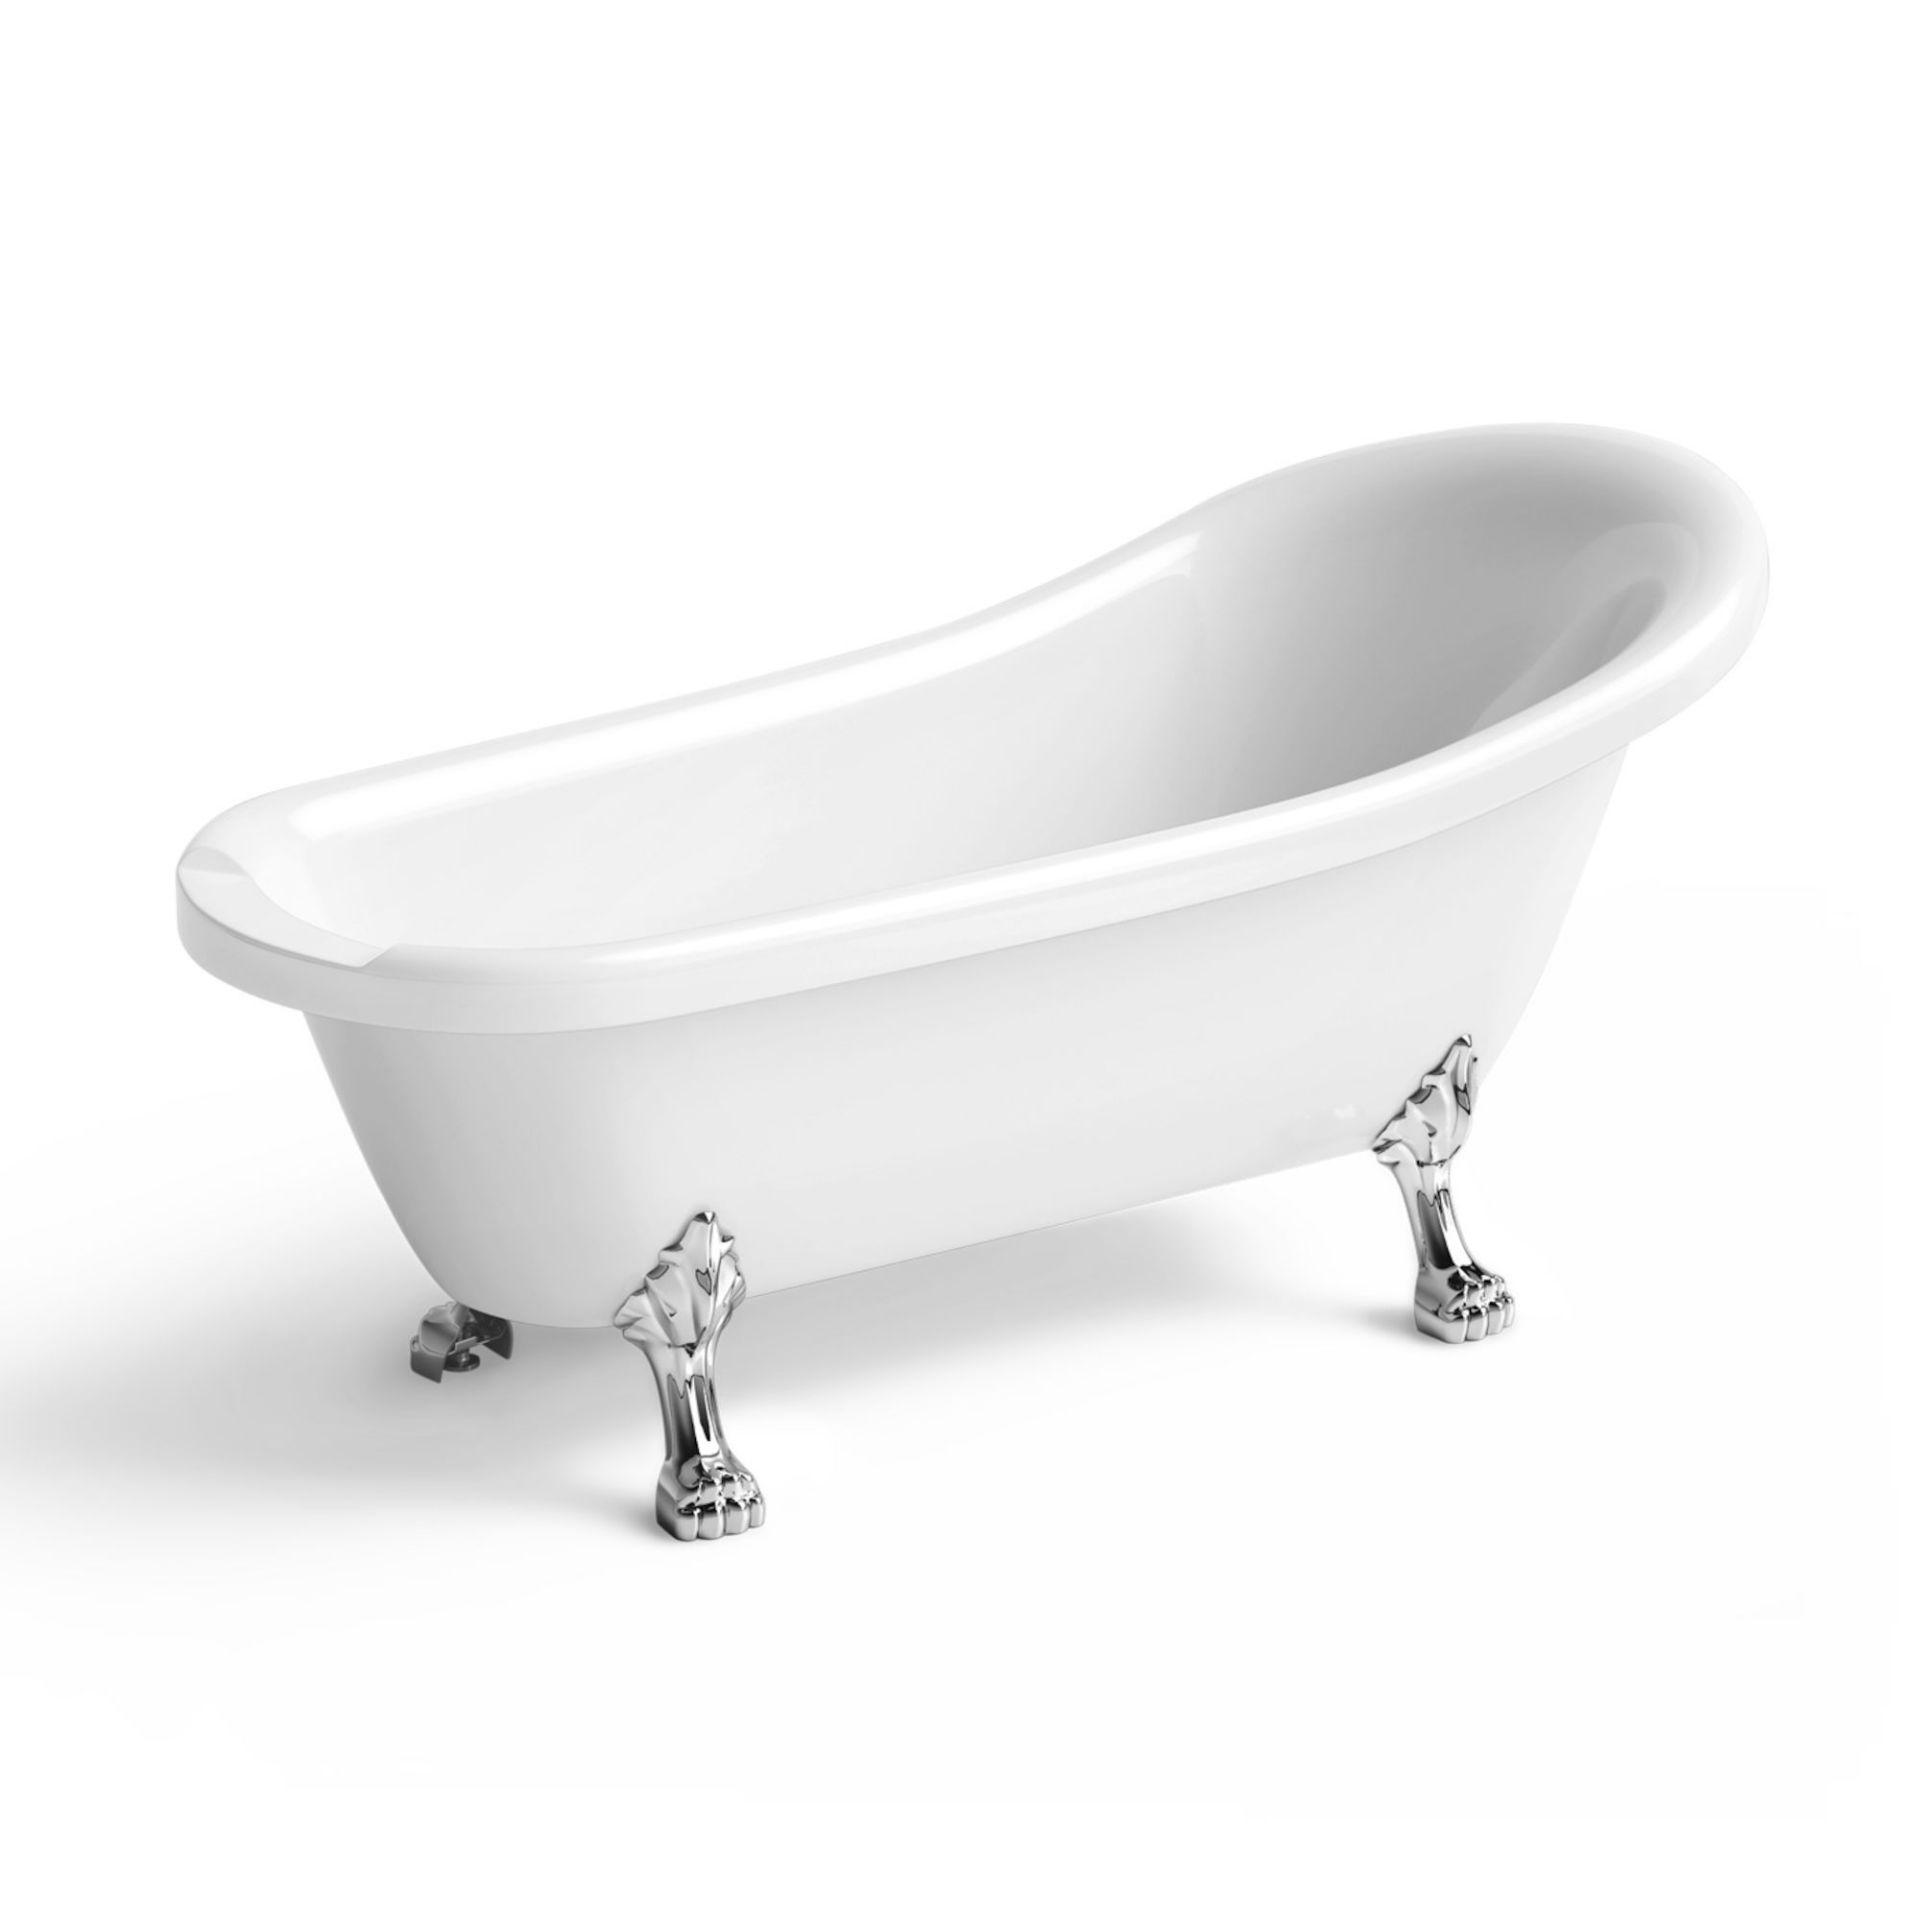 Lot 9 - (XX9) 1550mm Cambridge Traditional Roll Top Slipper Bath - Dragon Feet. RRP £699.99. Bath manu...